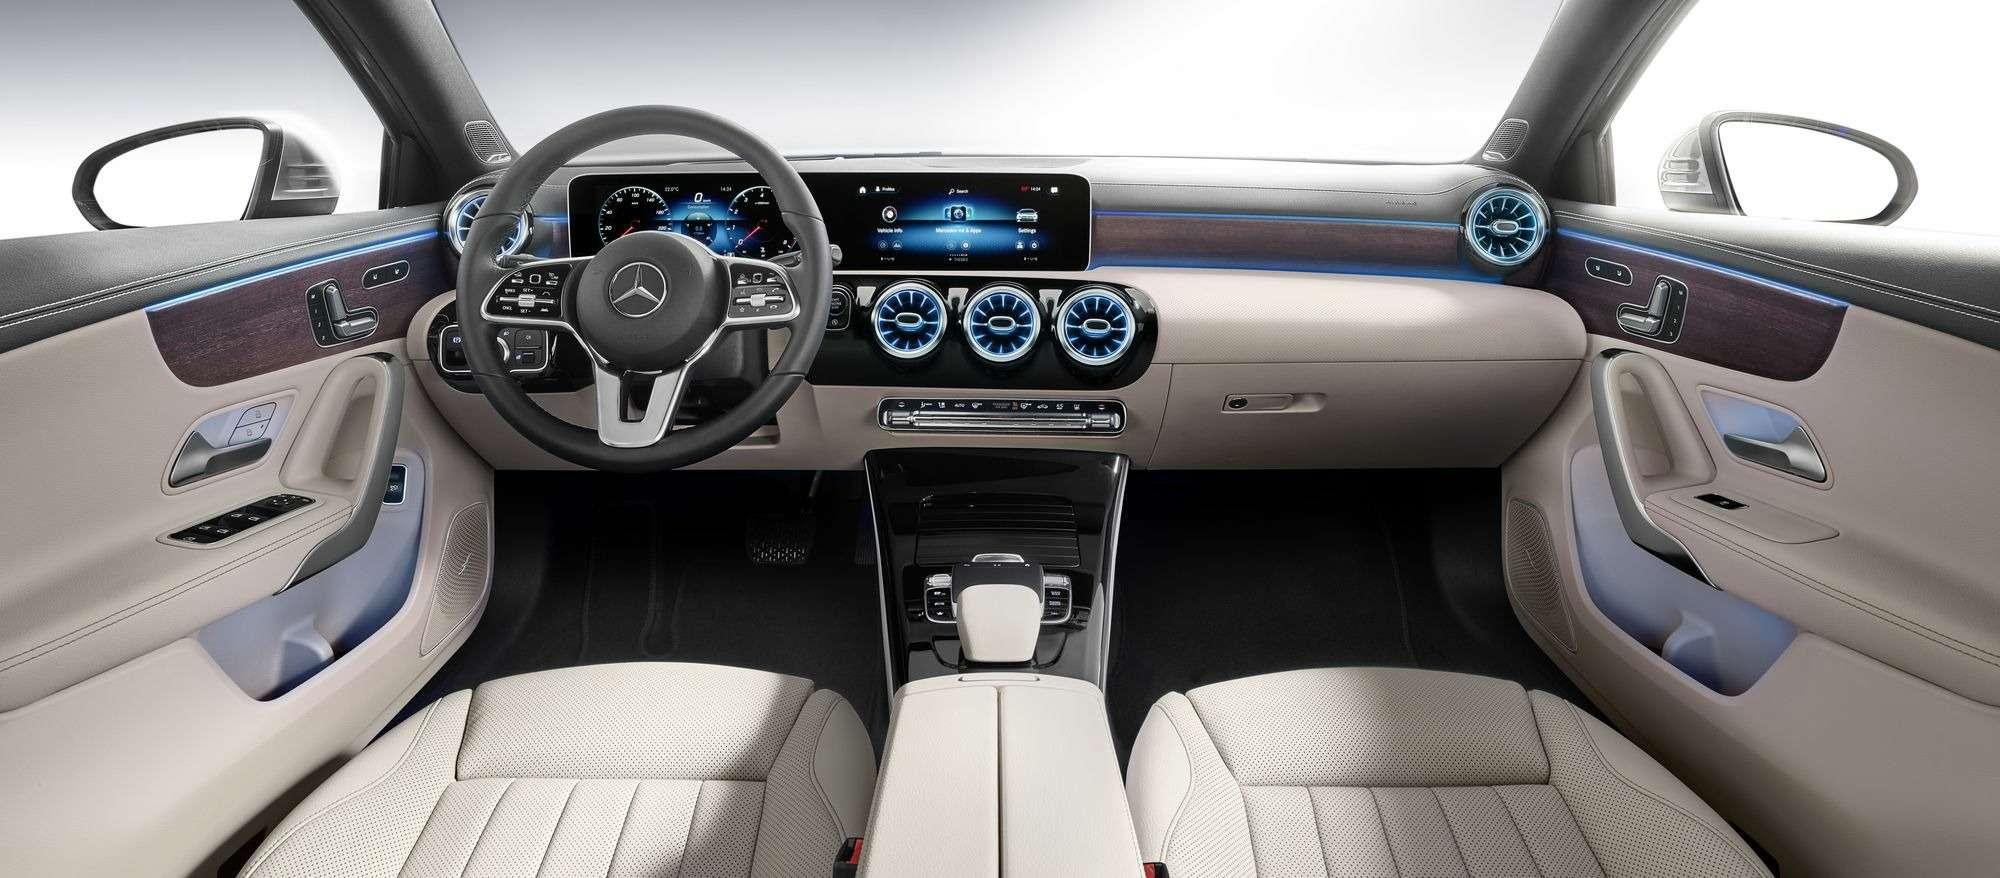 Евростандарт: представлен короткий седан Mercedes-Benz A-класса— фото 890435